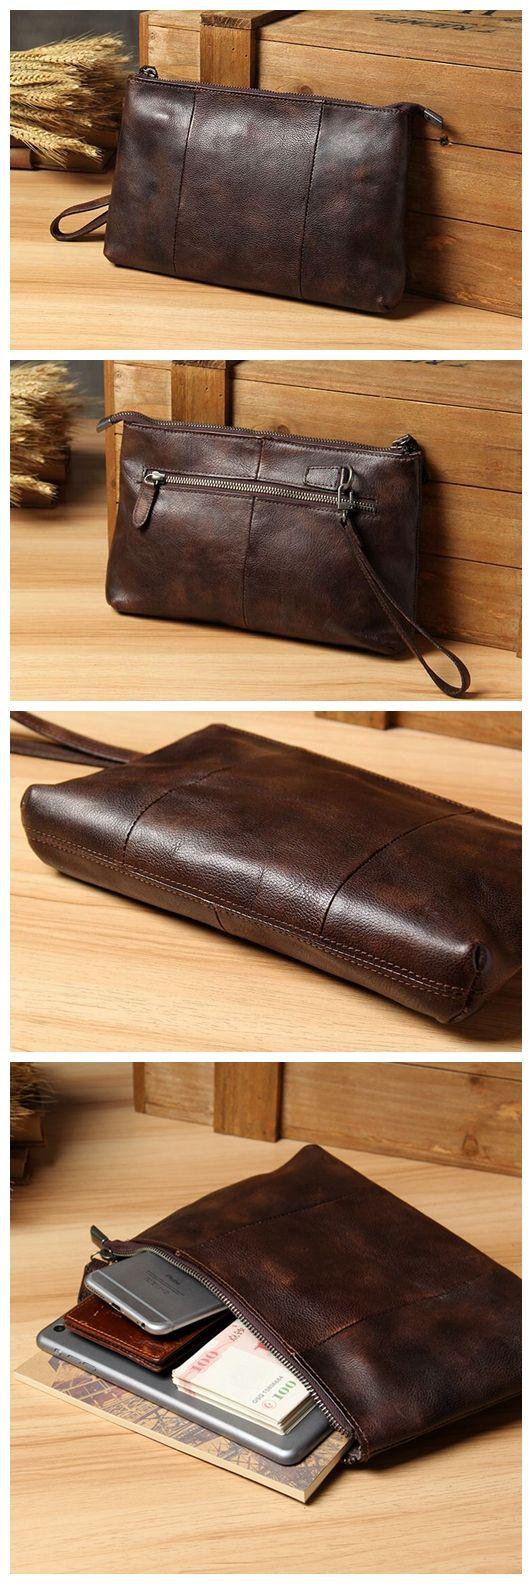 Handcrafted Men's Leather Clutch Handbag iPad Sleeve iPhone Case 14113